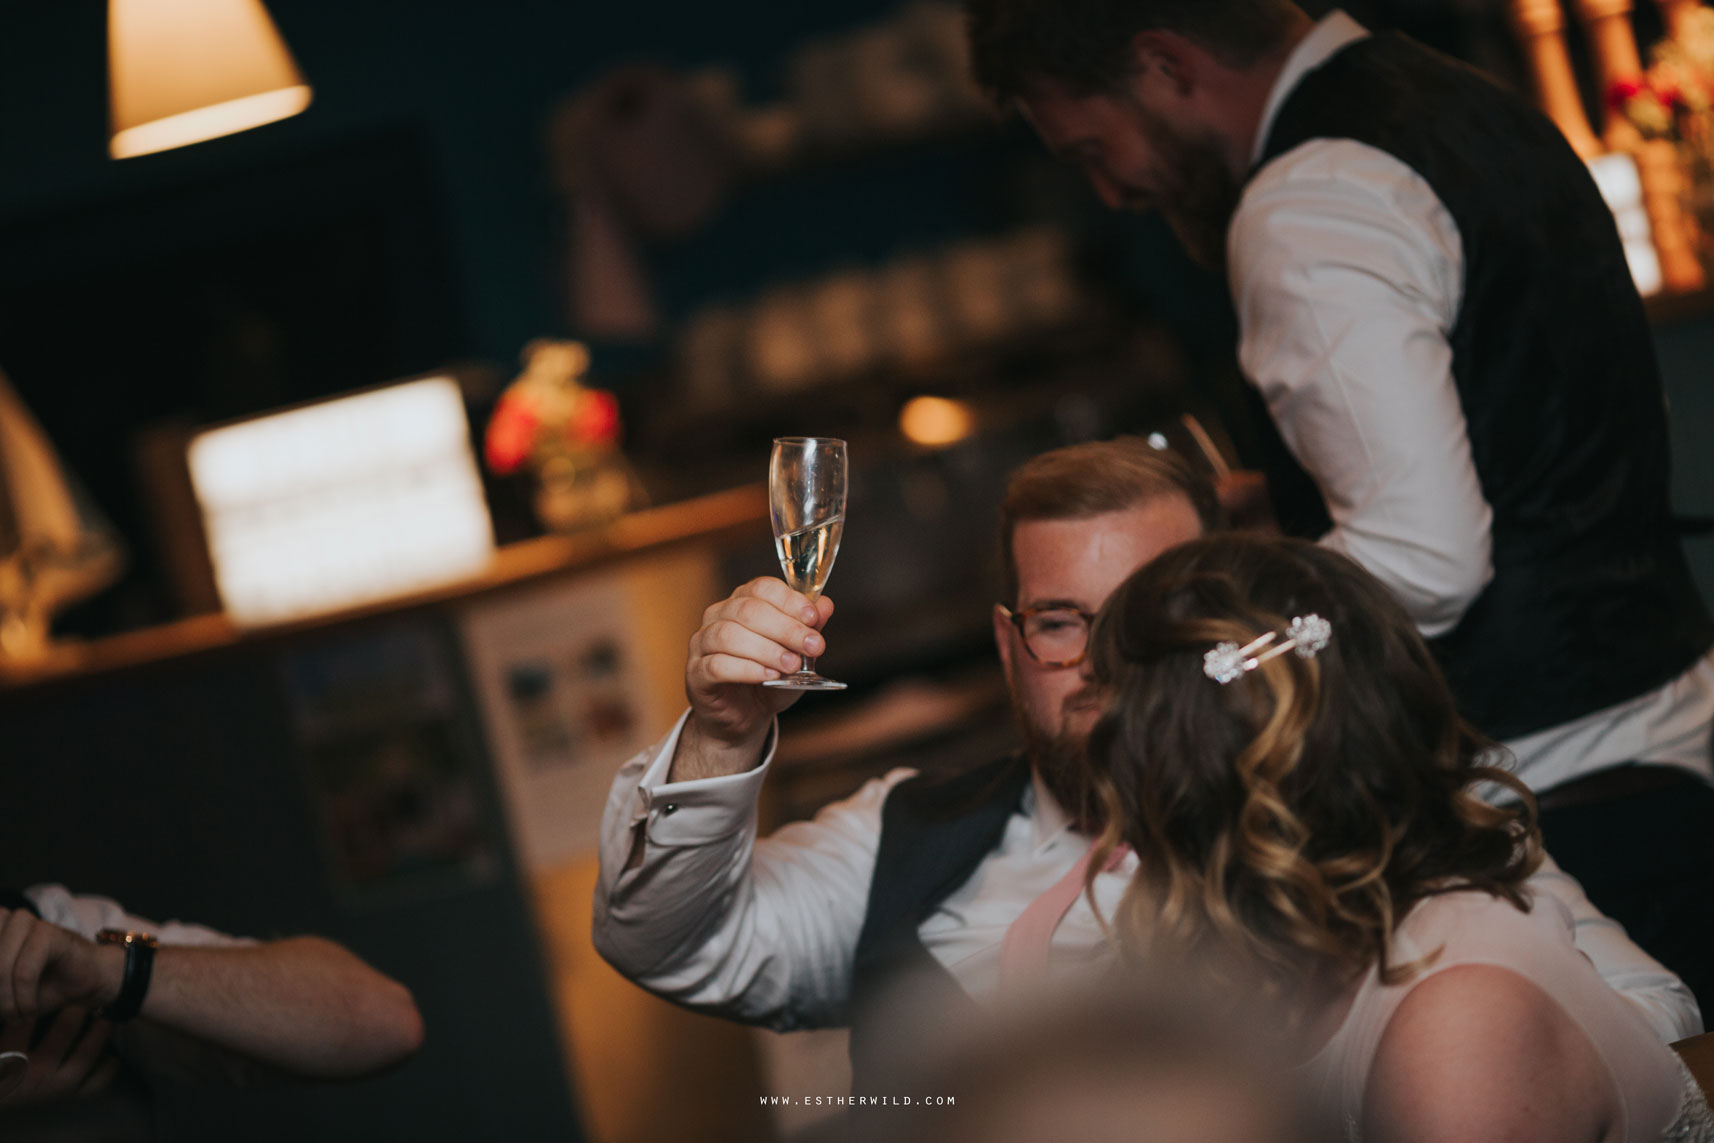 Cromer_Wedding_Beach_Outdoor_Ceremony_Norfolk_North_Lodge_Registry_Office_Rocket_House_Cafe_Cromer_Pier_IMG_5400_IMGL8700.jpg